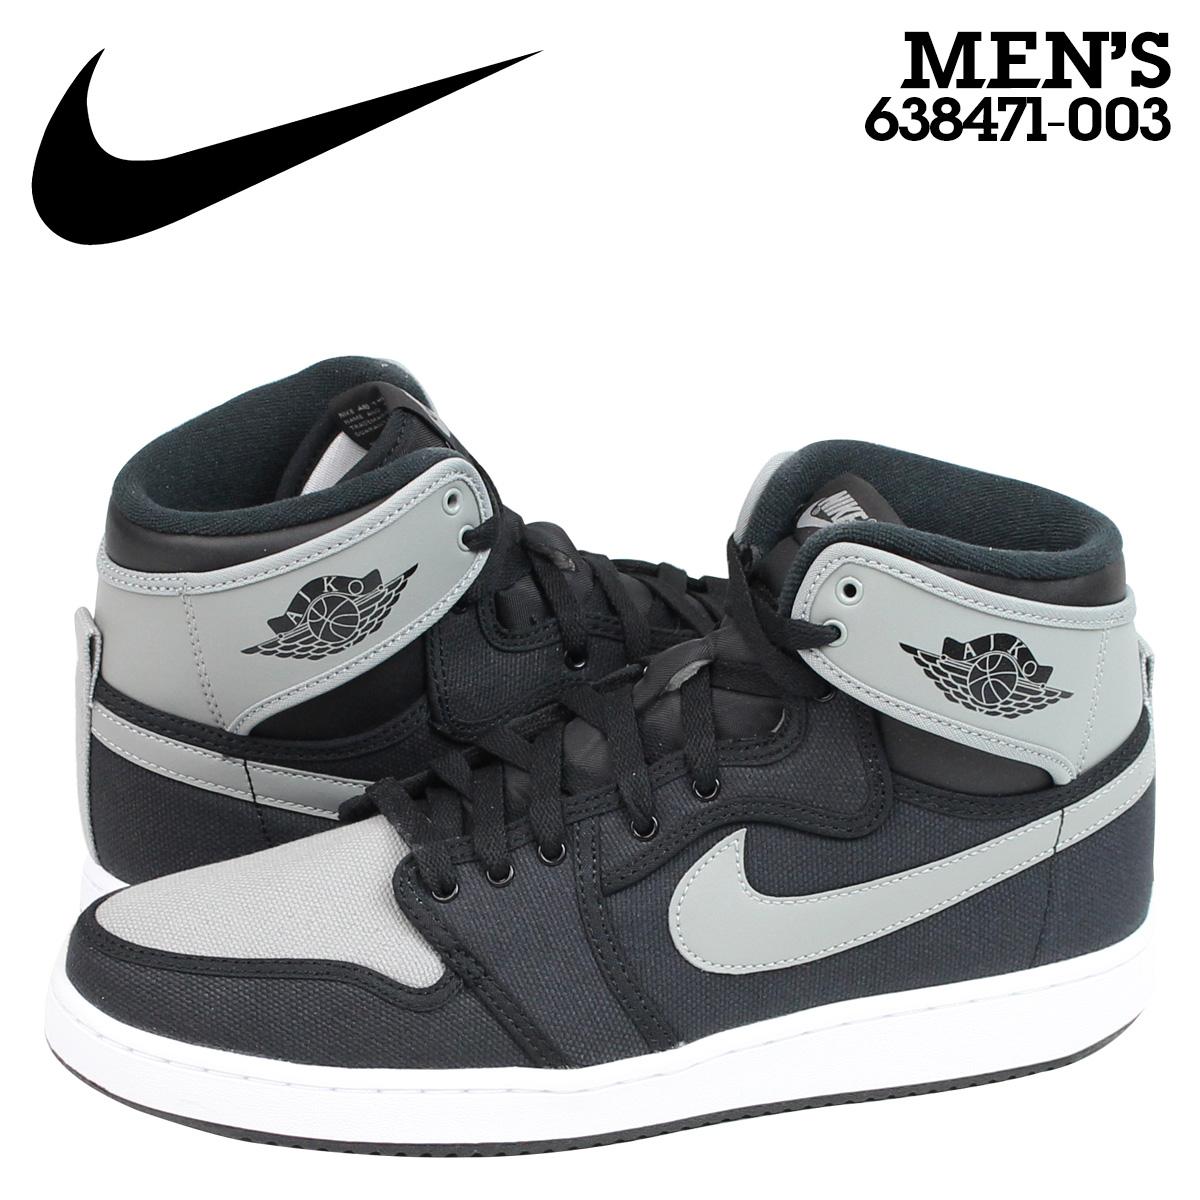 0d708d3b553 NIKE Nike Air Jordan sneakers AIR JORDAN 1 RETRO KO HI OG Air Jordan 1  nostalgic ...